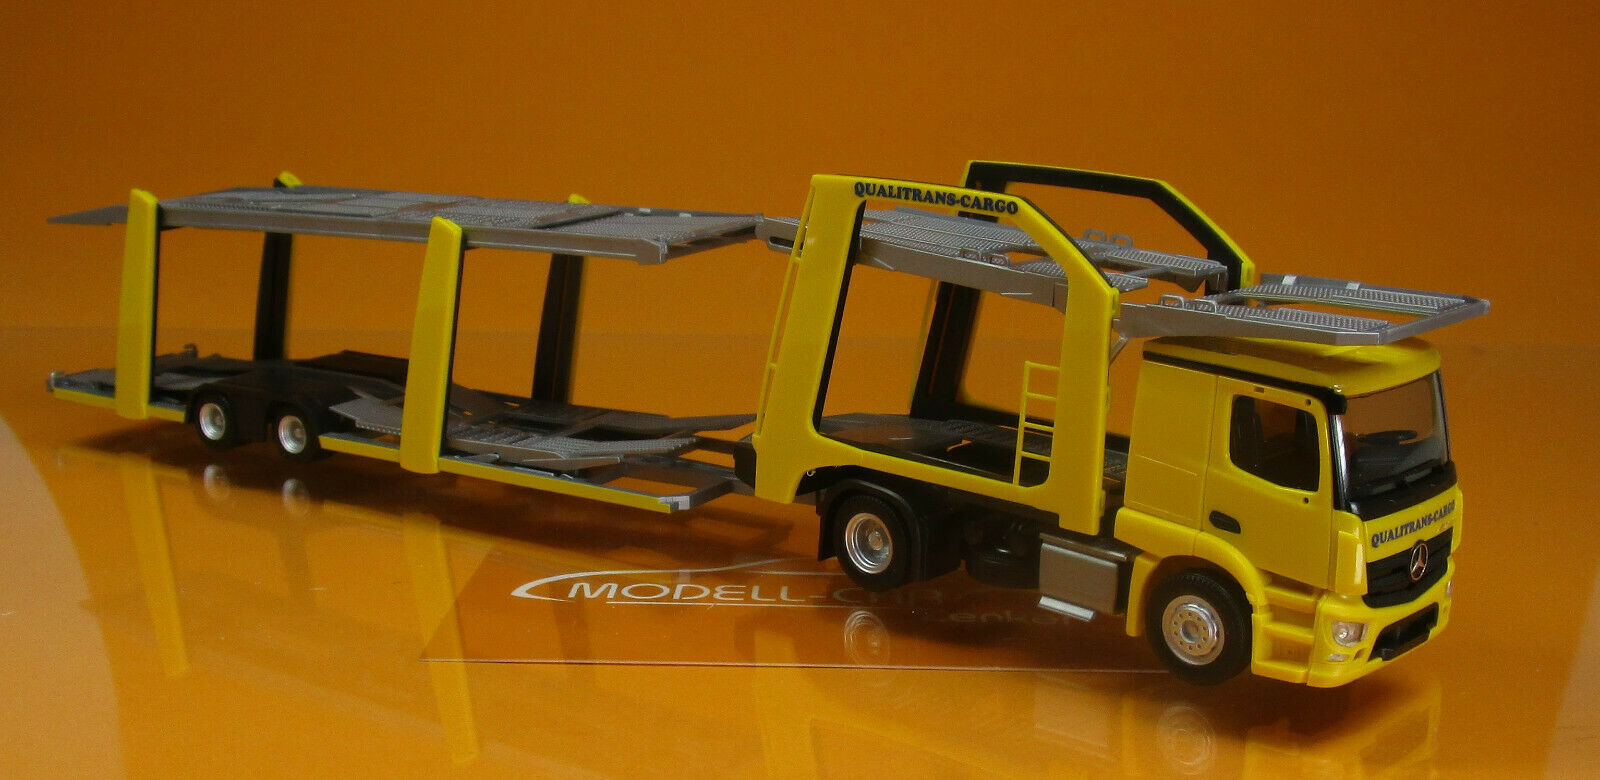 Herpa 309790 MB A Eurol. Autotransporter Qualitrans Cargo Scale 1 1 1 87  | Großer Räumungsverkauf  f35a52